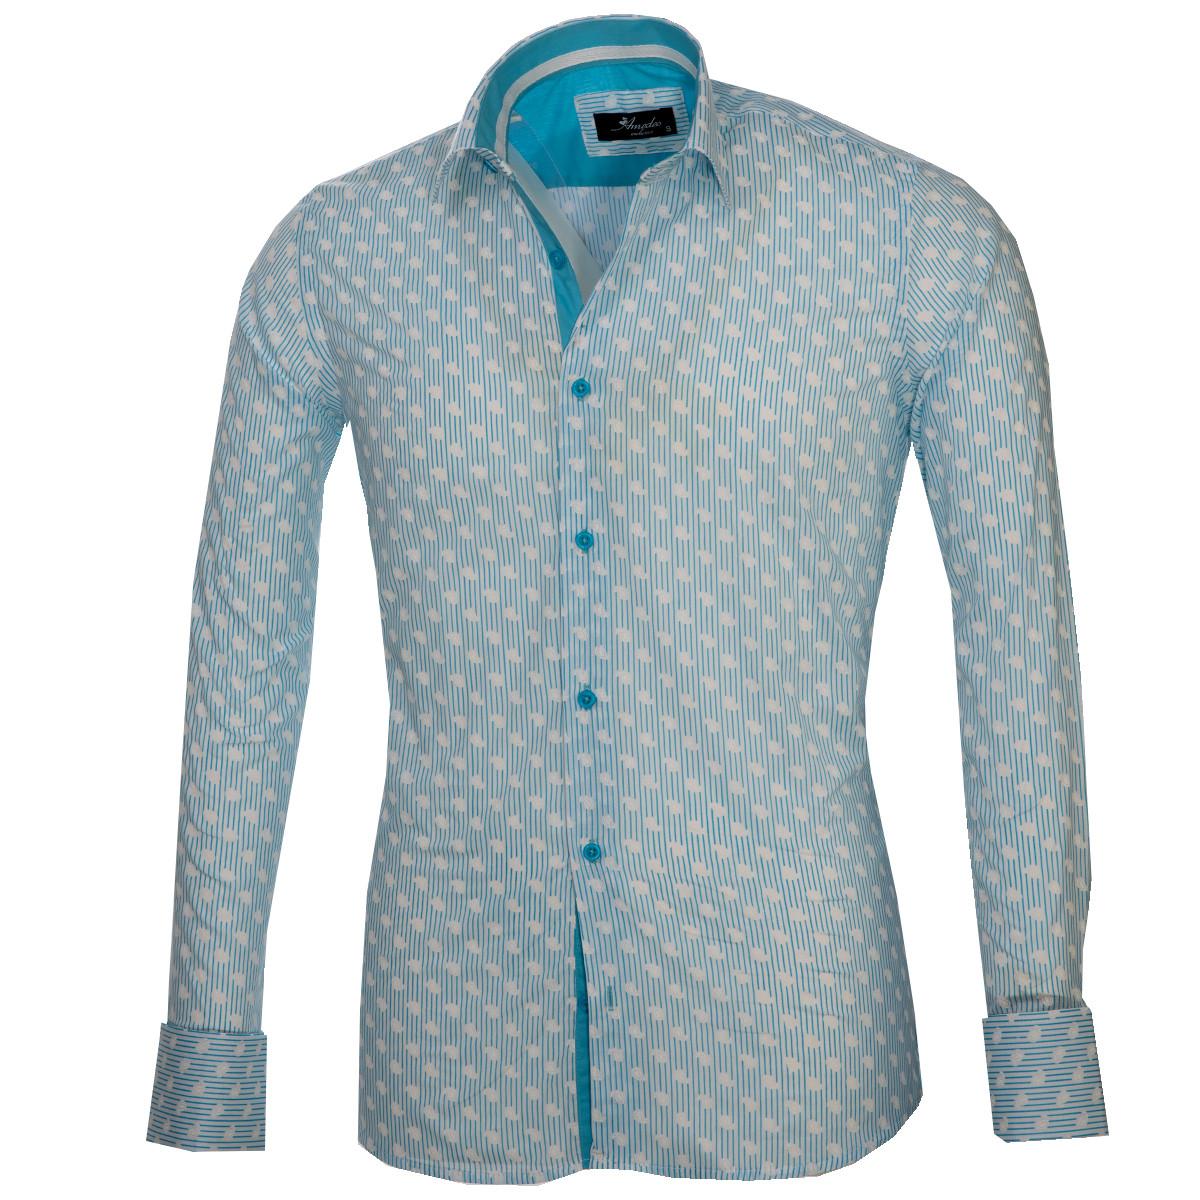 European Made & Designed Reversible Cuff Premium French Cuff Dress Shirt - white & blue paisley